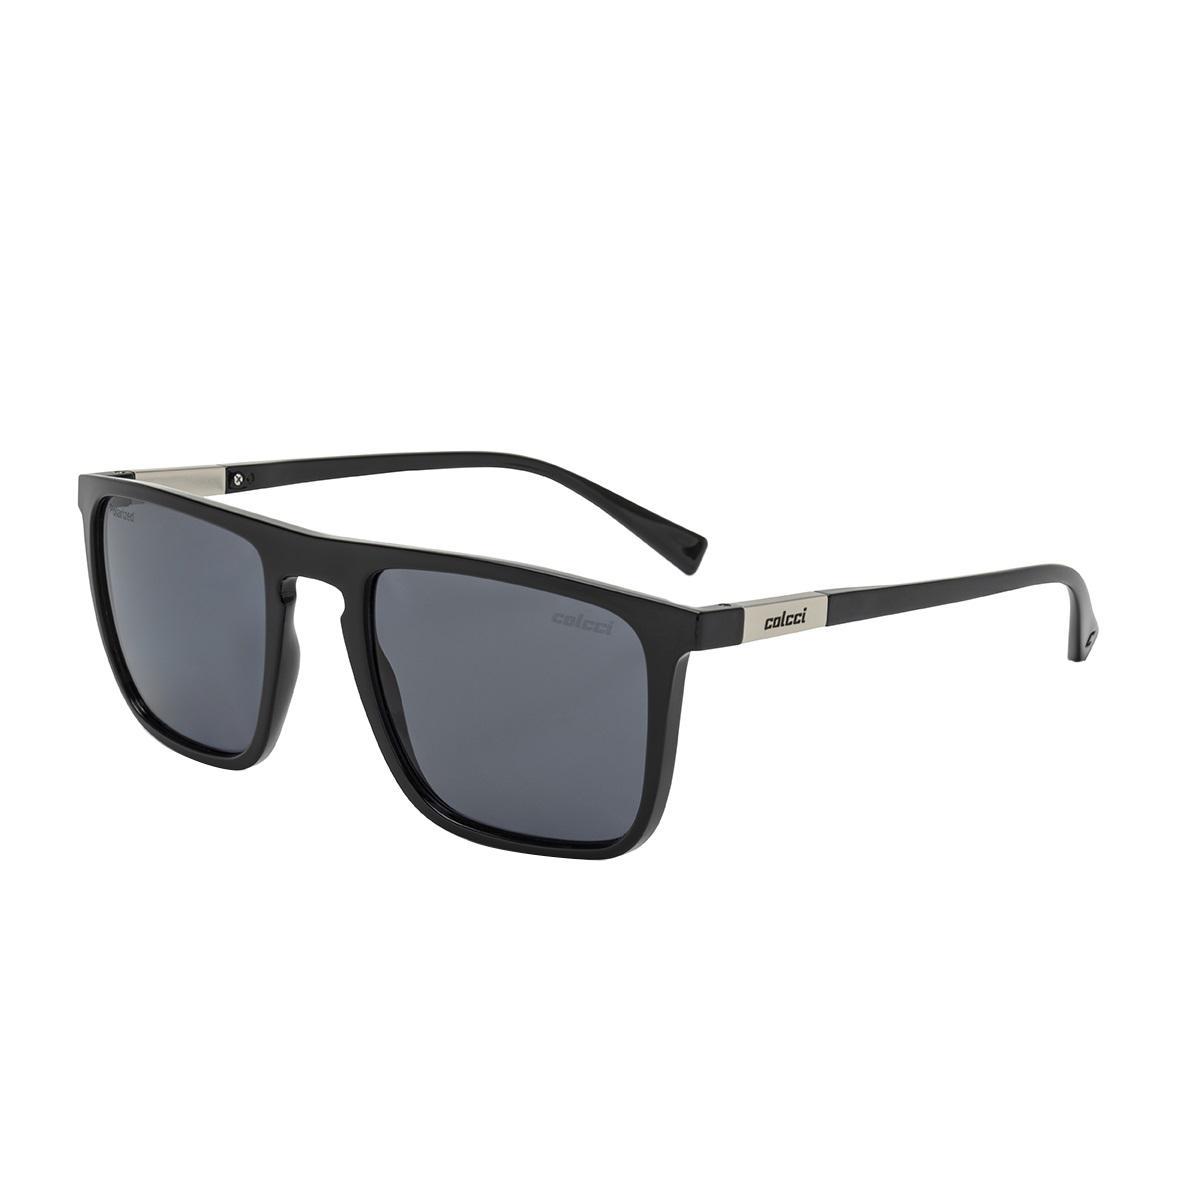 7dc4a702c0c6d Óculos De Sol Colcci C0130 Martin Preto Lente Cinza Polarizada R  399